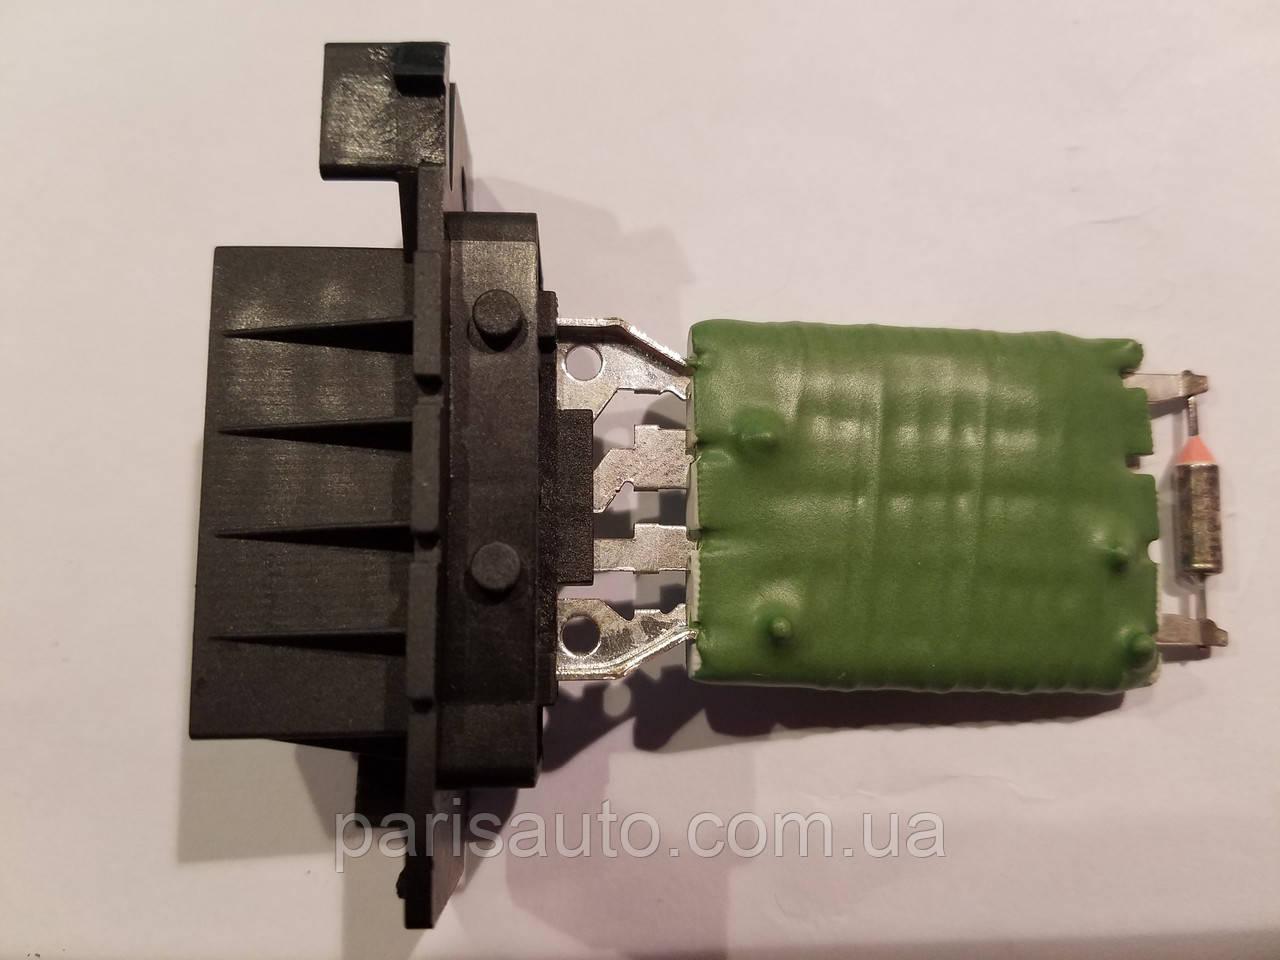 Резистор печки электродвигателя вентилятора FIAT DOBLO (152, 263), GRANDEPUNTO (199), QUBO (225); OPEL CORSA D